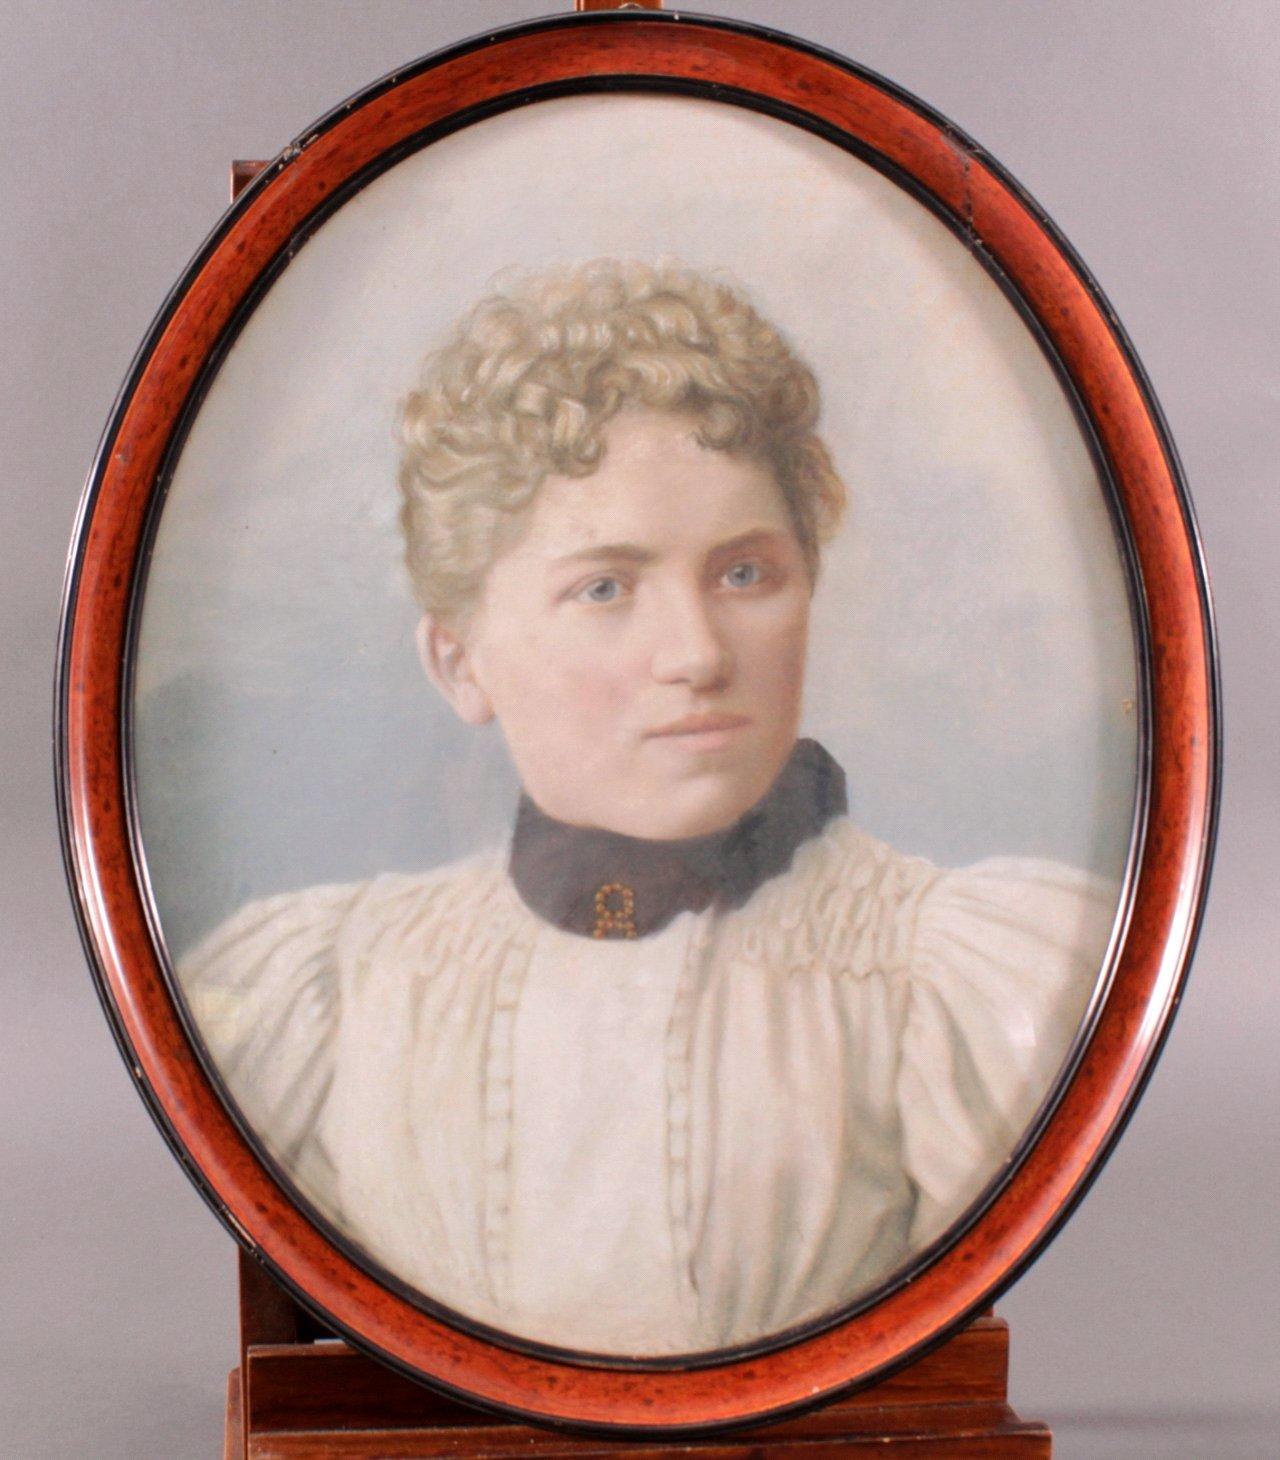 Damenporträt um 1900